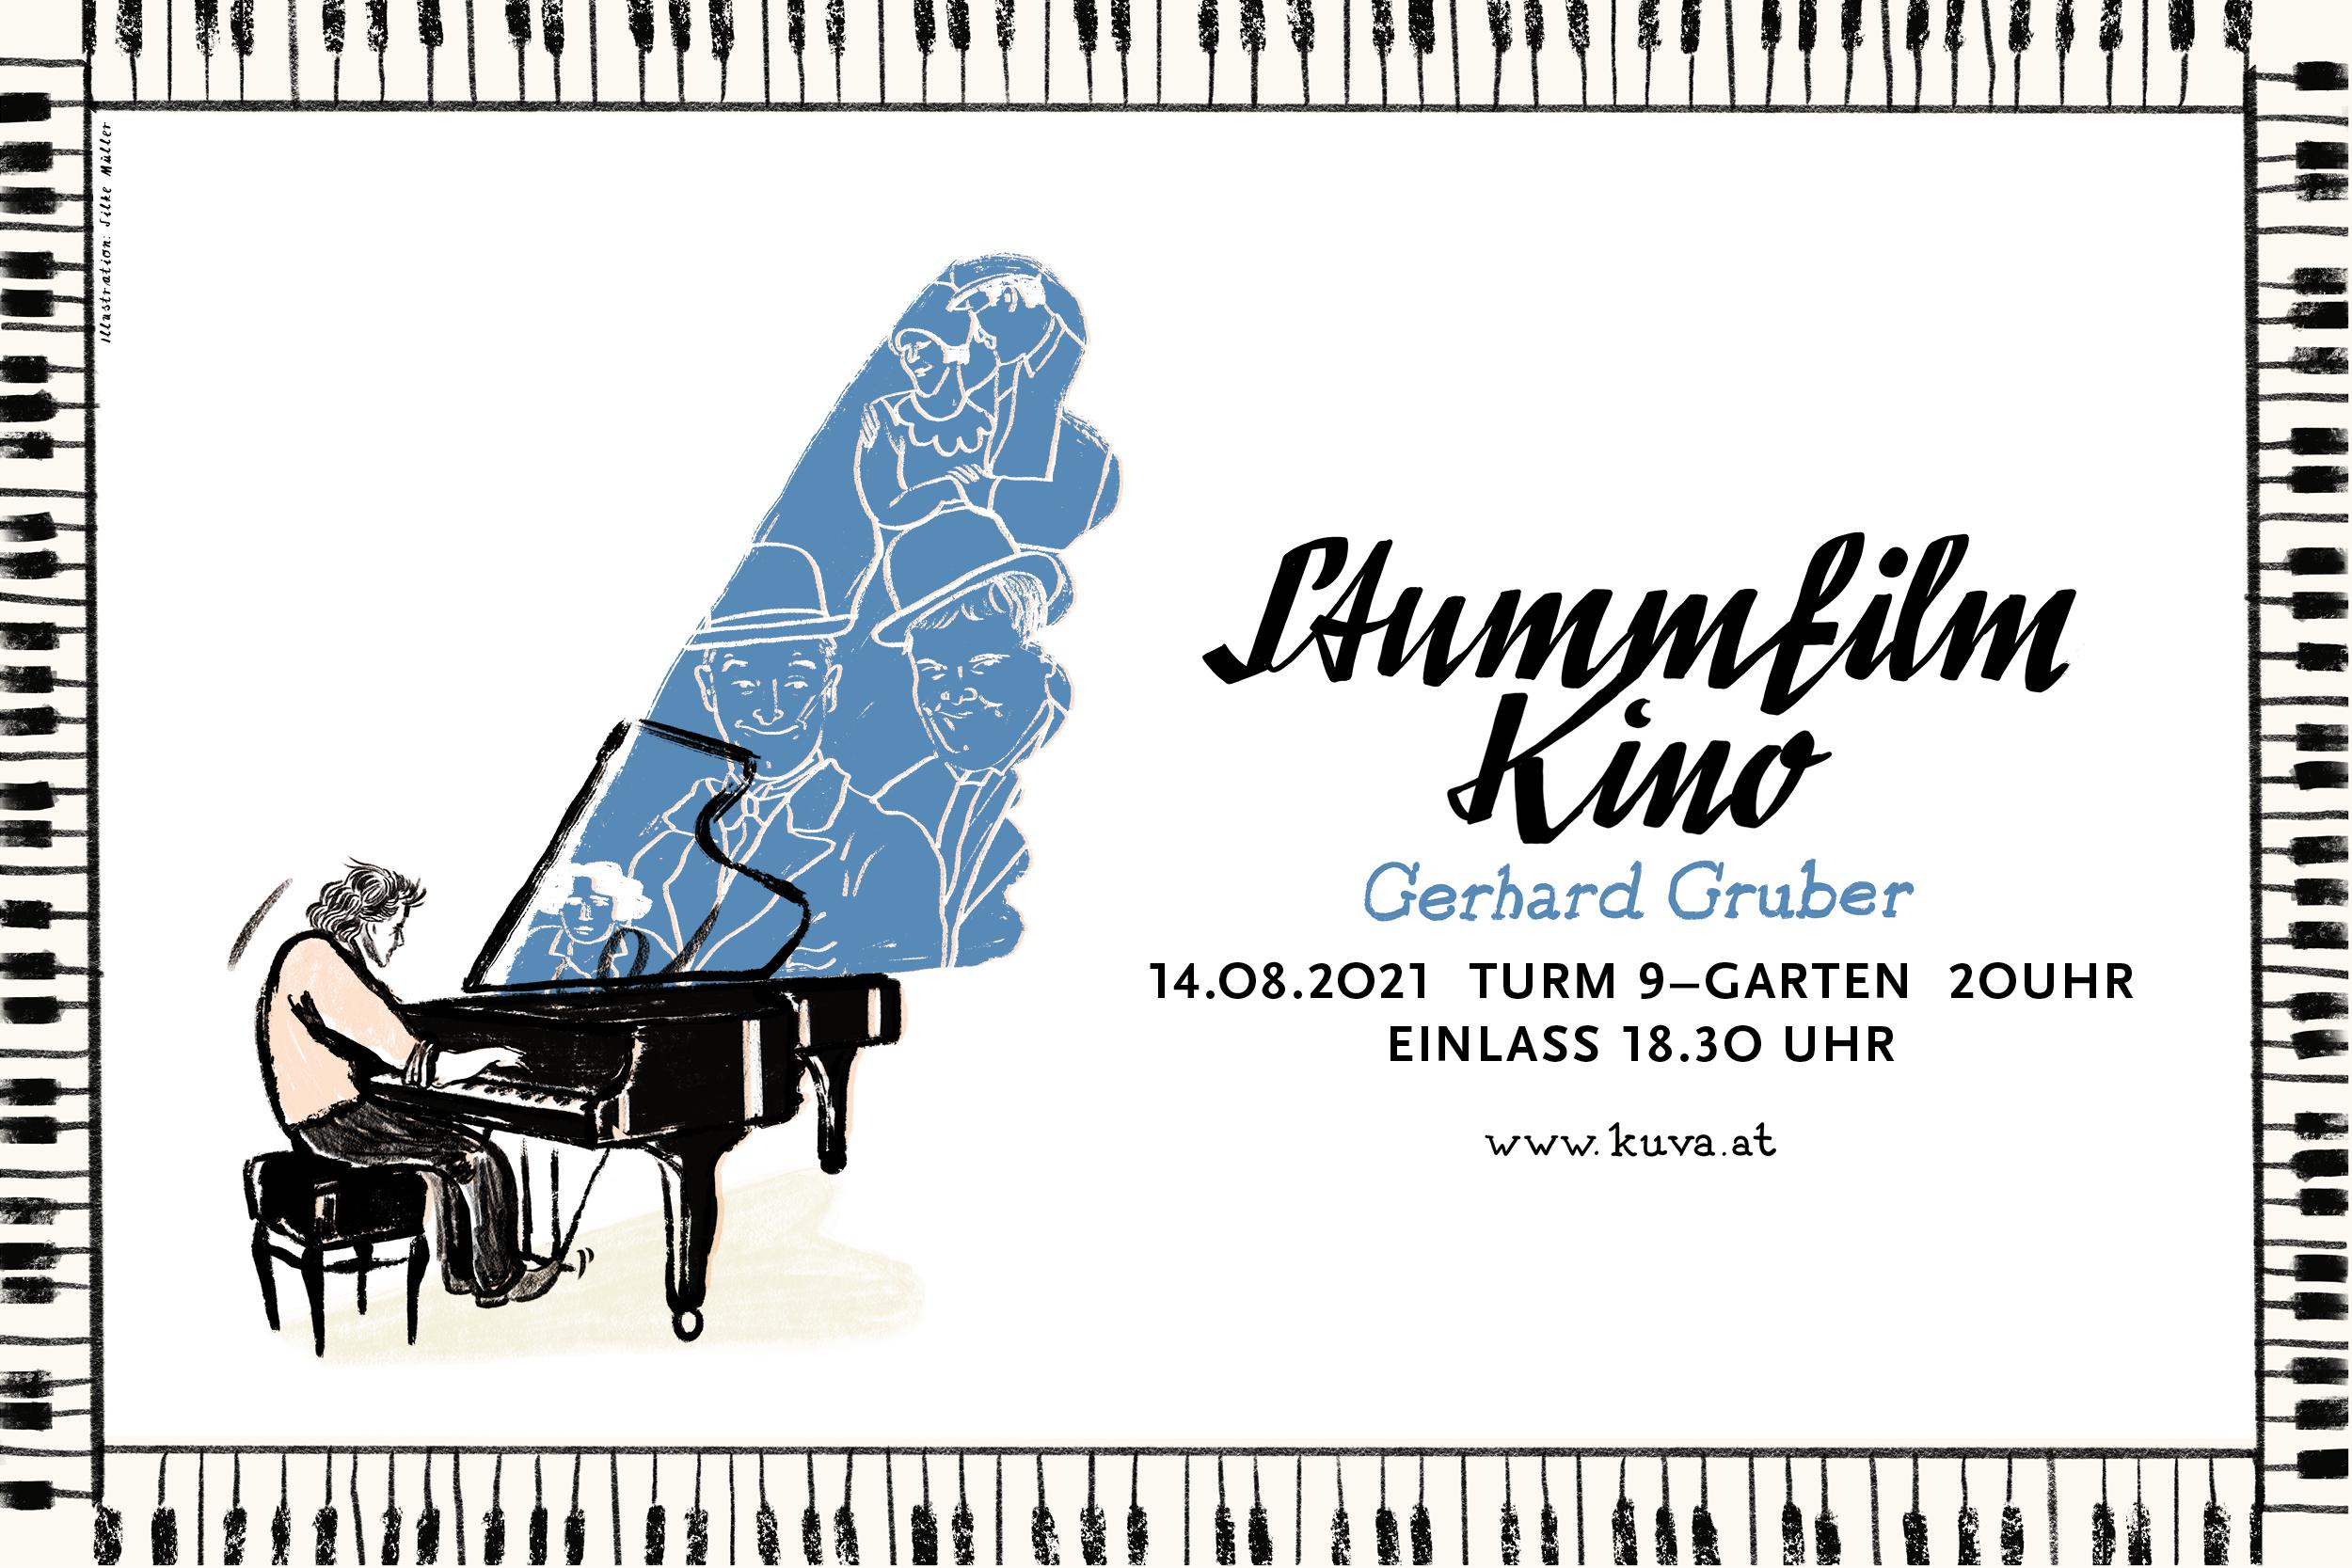 Stummfilmkino | Gerhard Gruber | KUVA | Illustration: Silke Müller